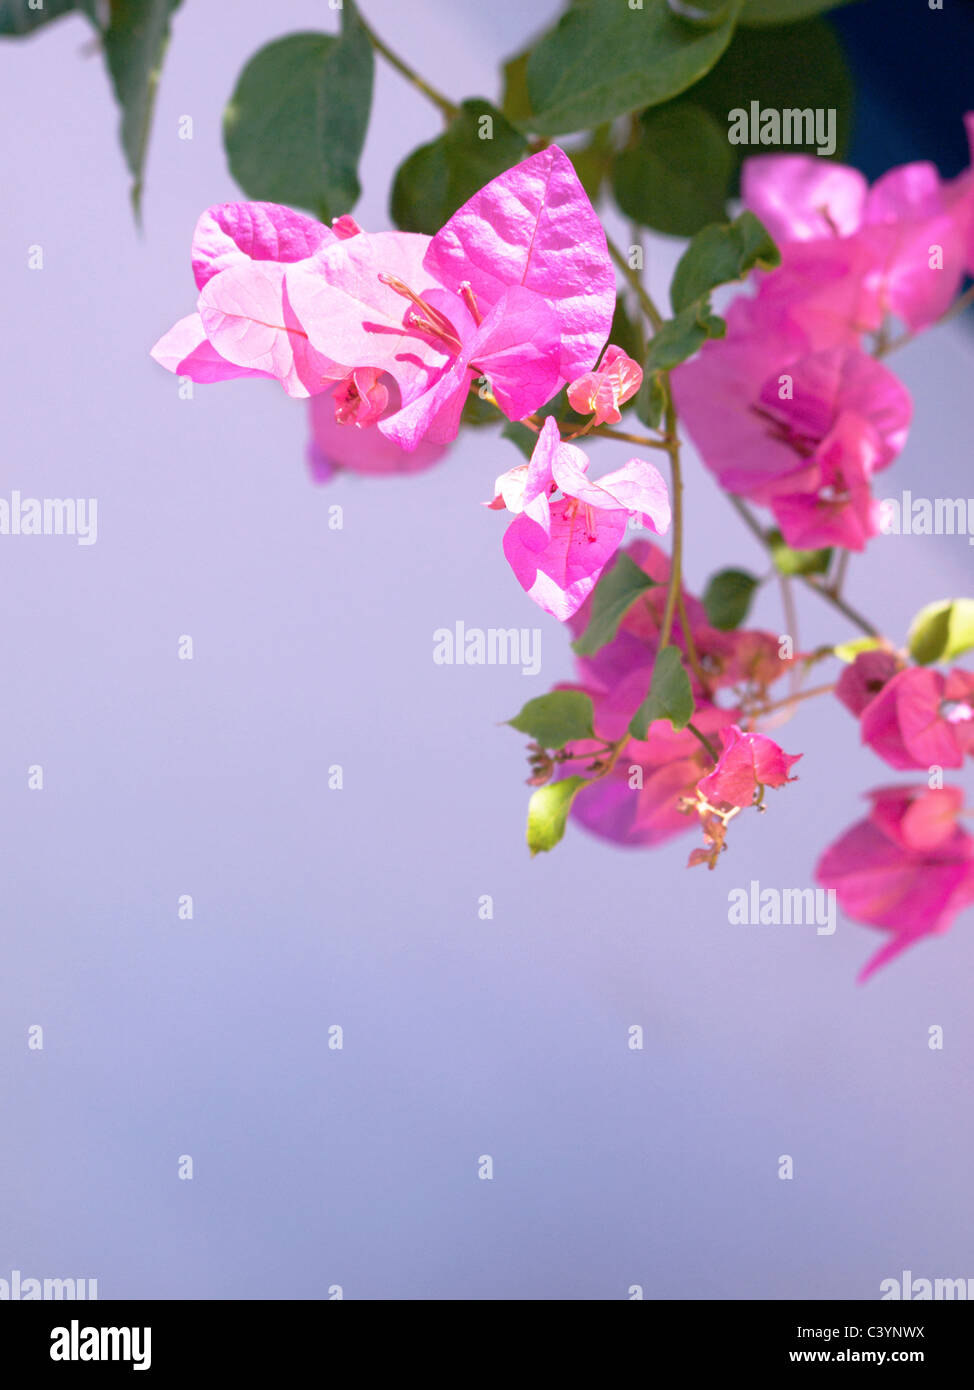 Pink mediterranean flower stock photos pink mediterranean flower pink mediterranean flower on lilac background stock image mightylinksfo